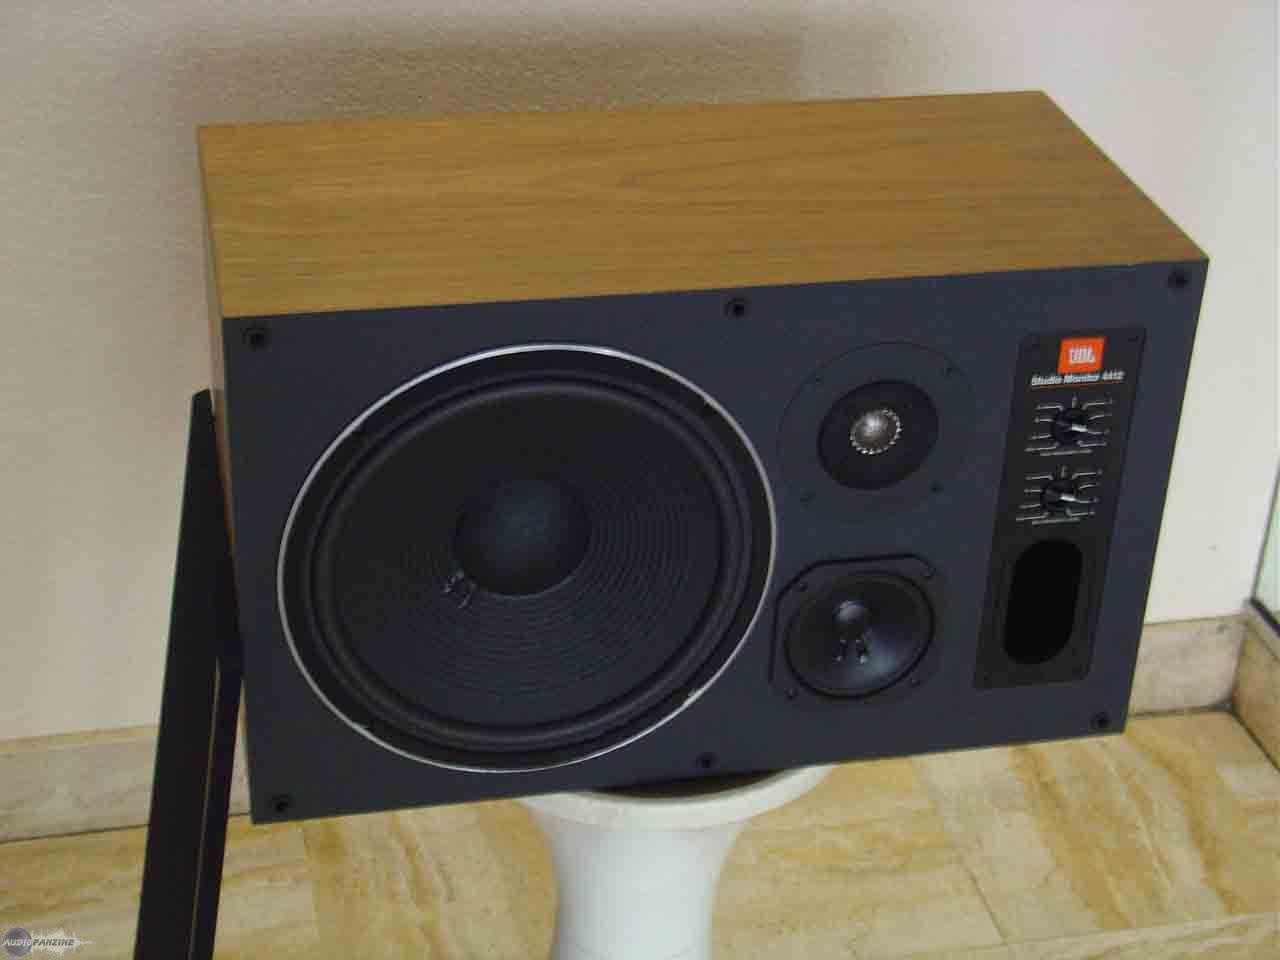 4412 studio monitor jbl 4412 studio monitor audiofanzine. Black Bedroom Furniture Sets. Home Design Ideas